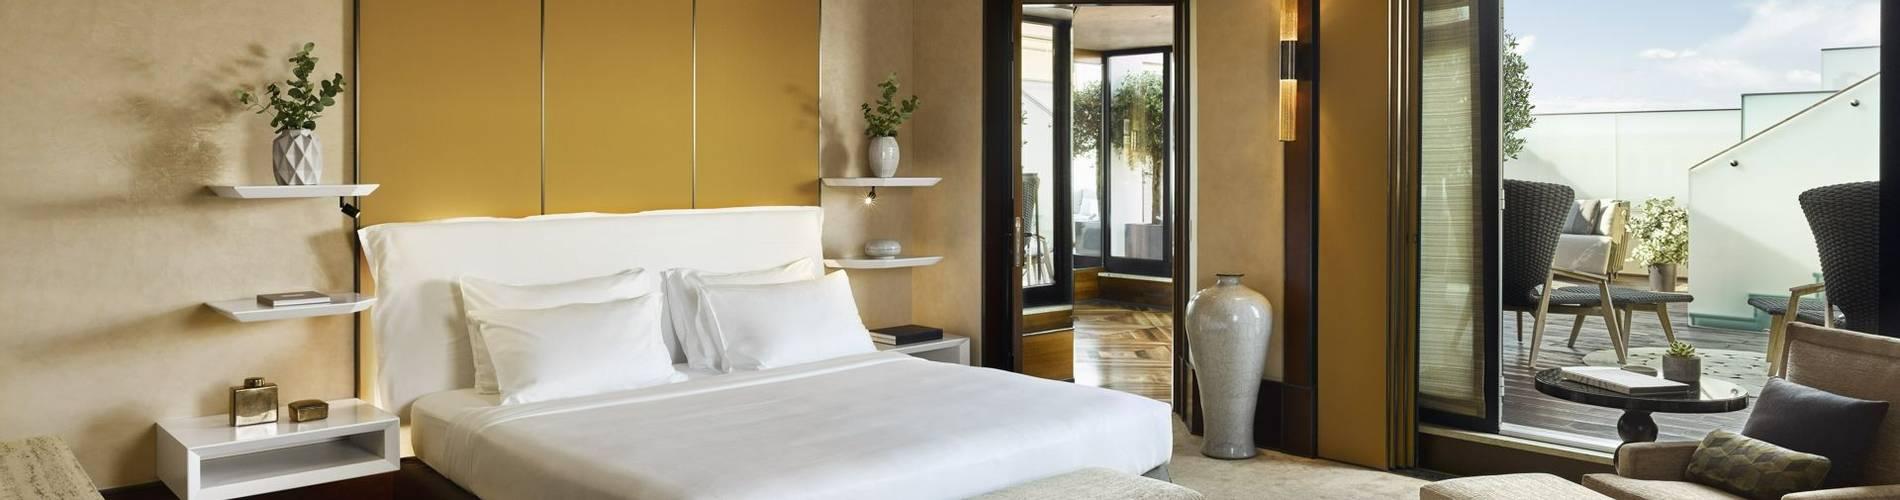 Park-Hyatt-Milano-DuomoSuite-Bedroom (1).jpg